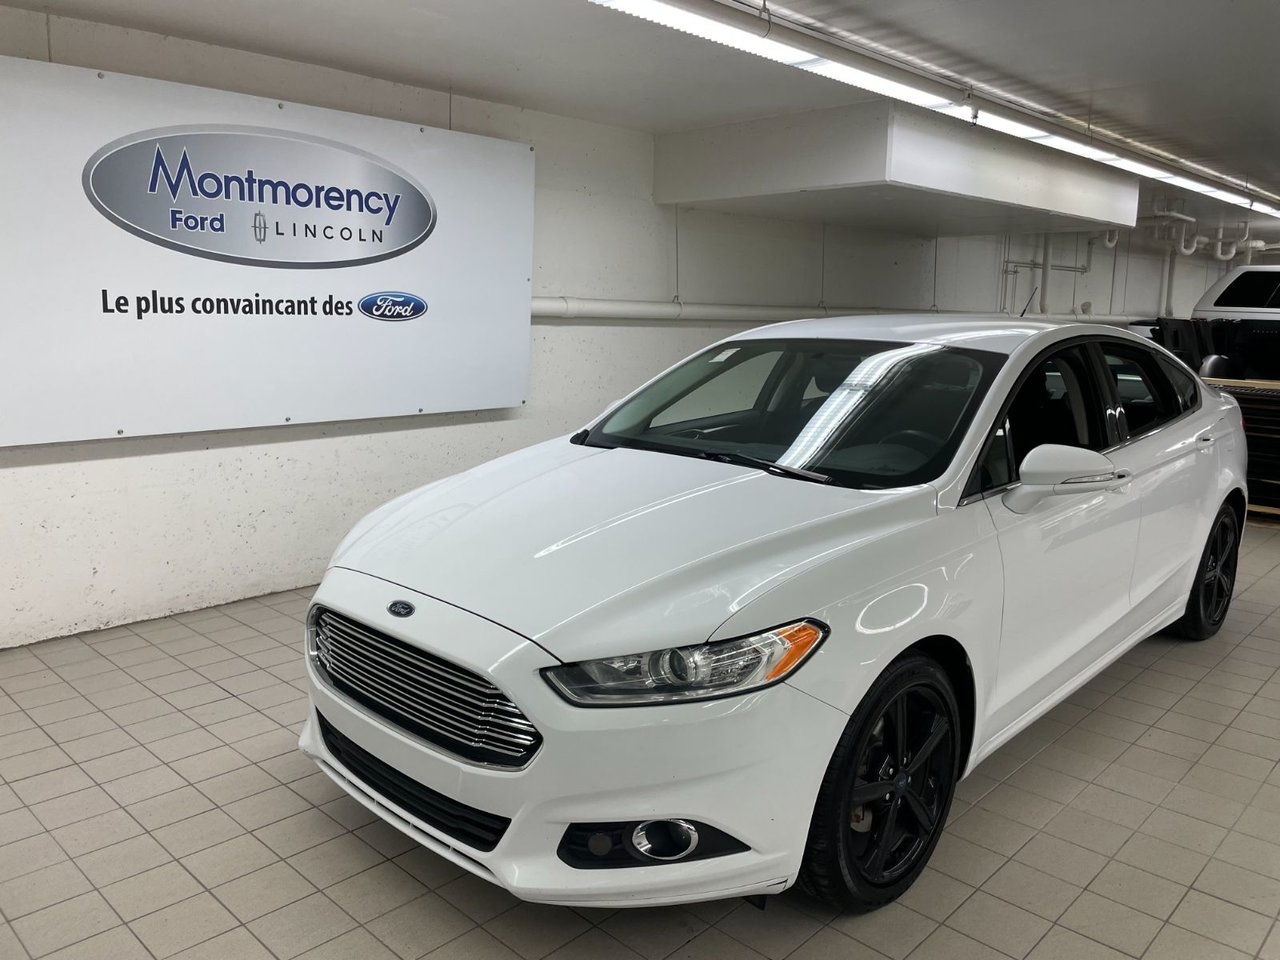 Ford Fusion 2015 SE 2.0L ECOBOOST - CAMÉRA, SIÈGES CHAUFFANTS